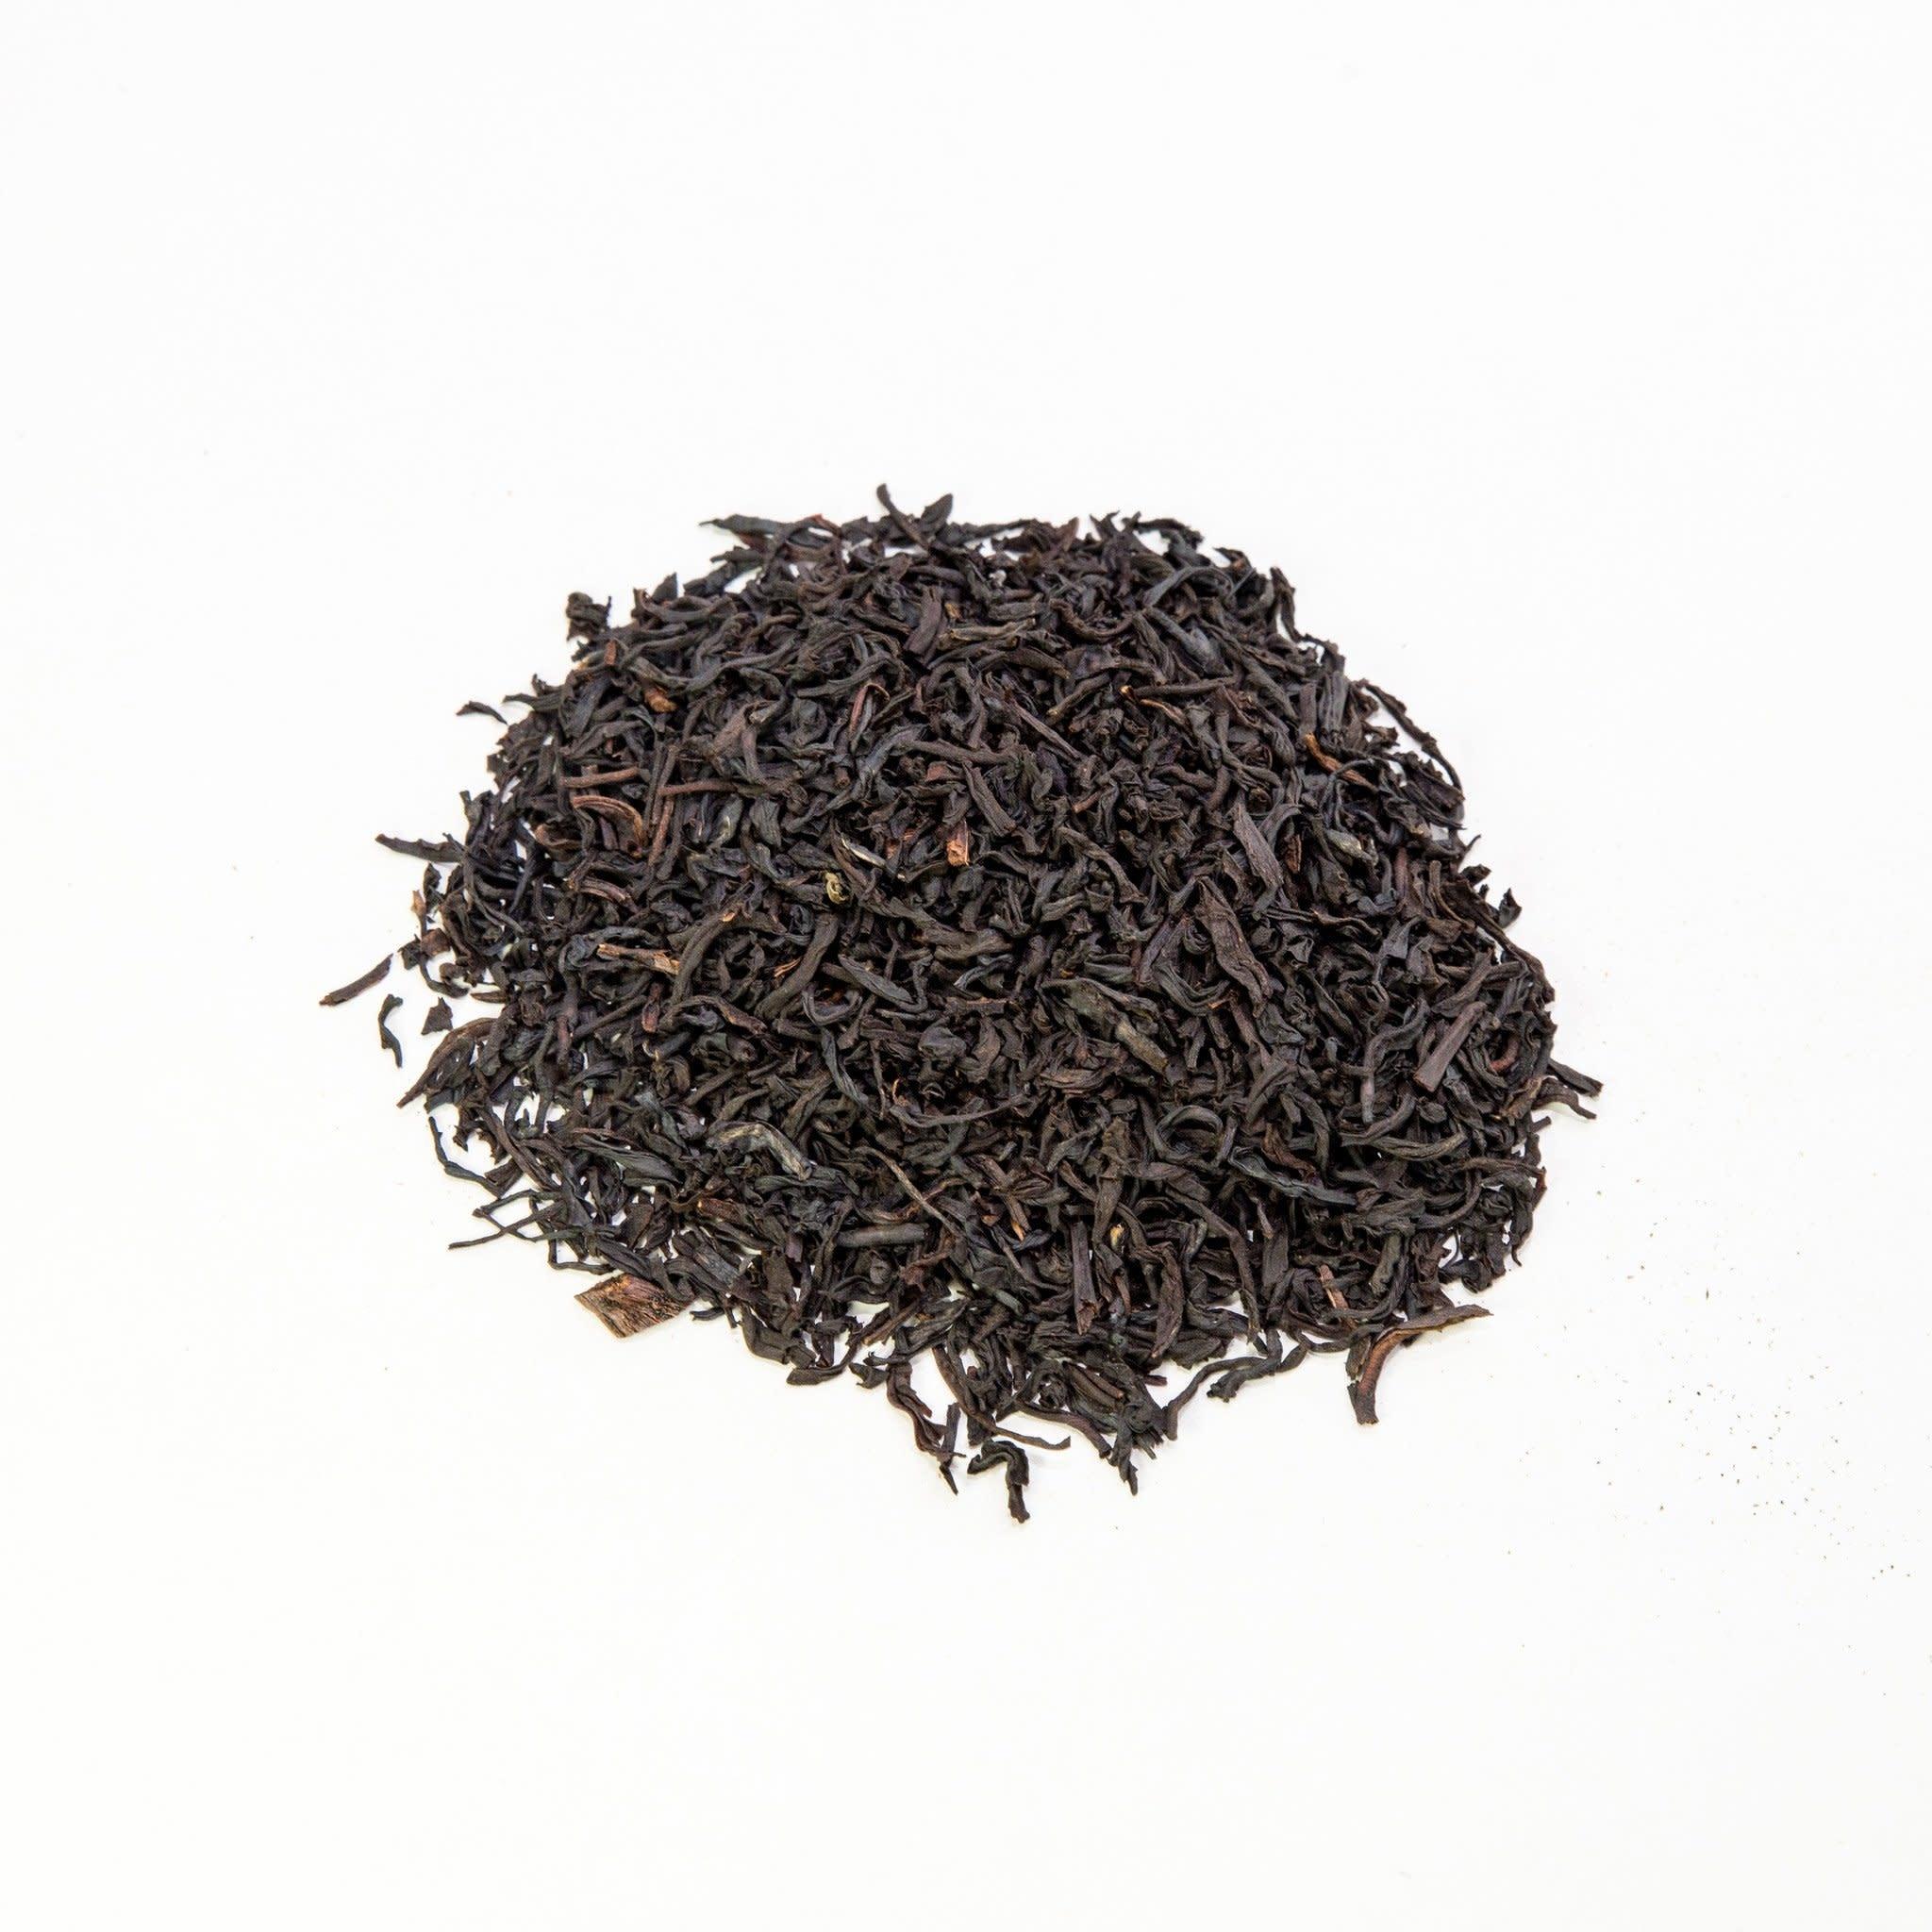 Naked Leaf Lapsang Souchong Bulk Tea 50g